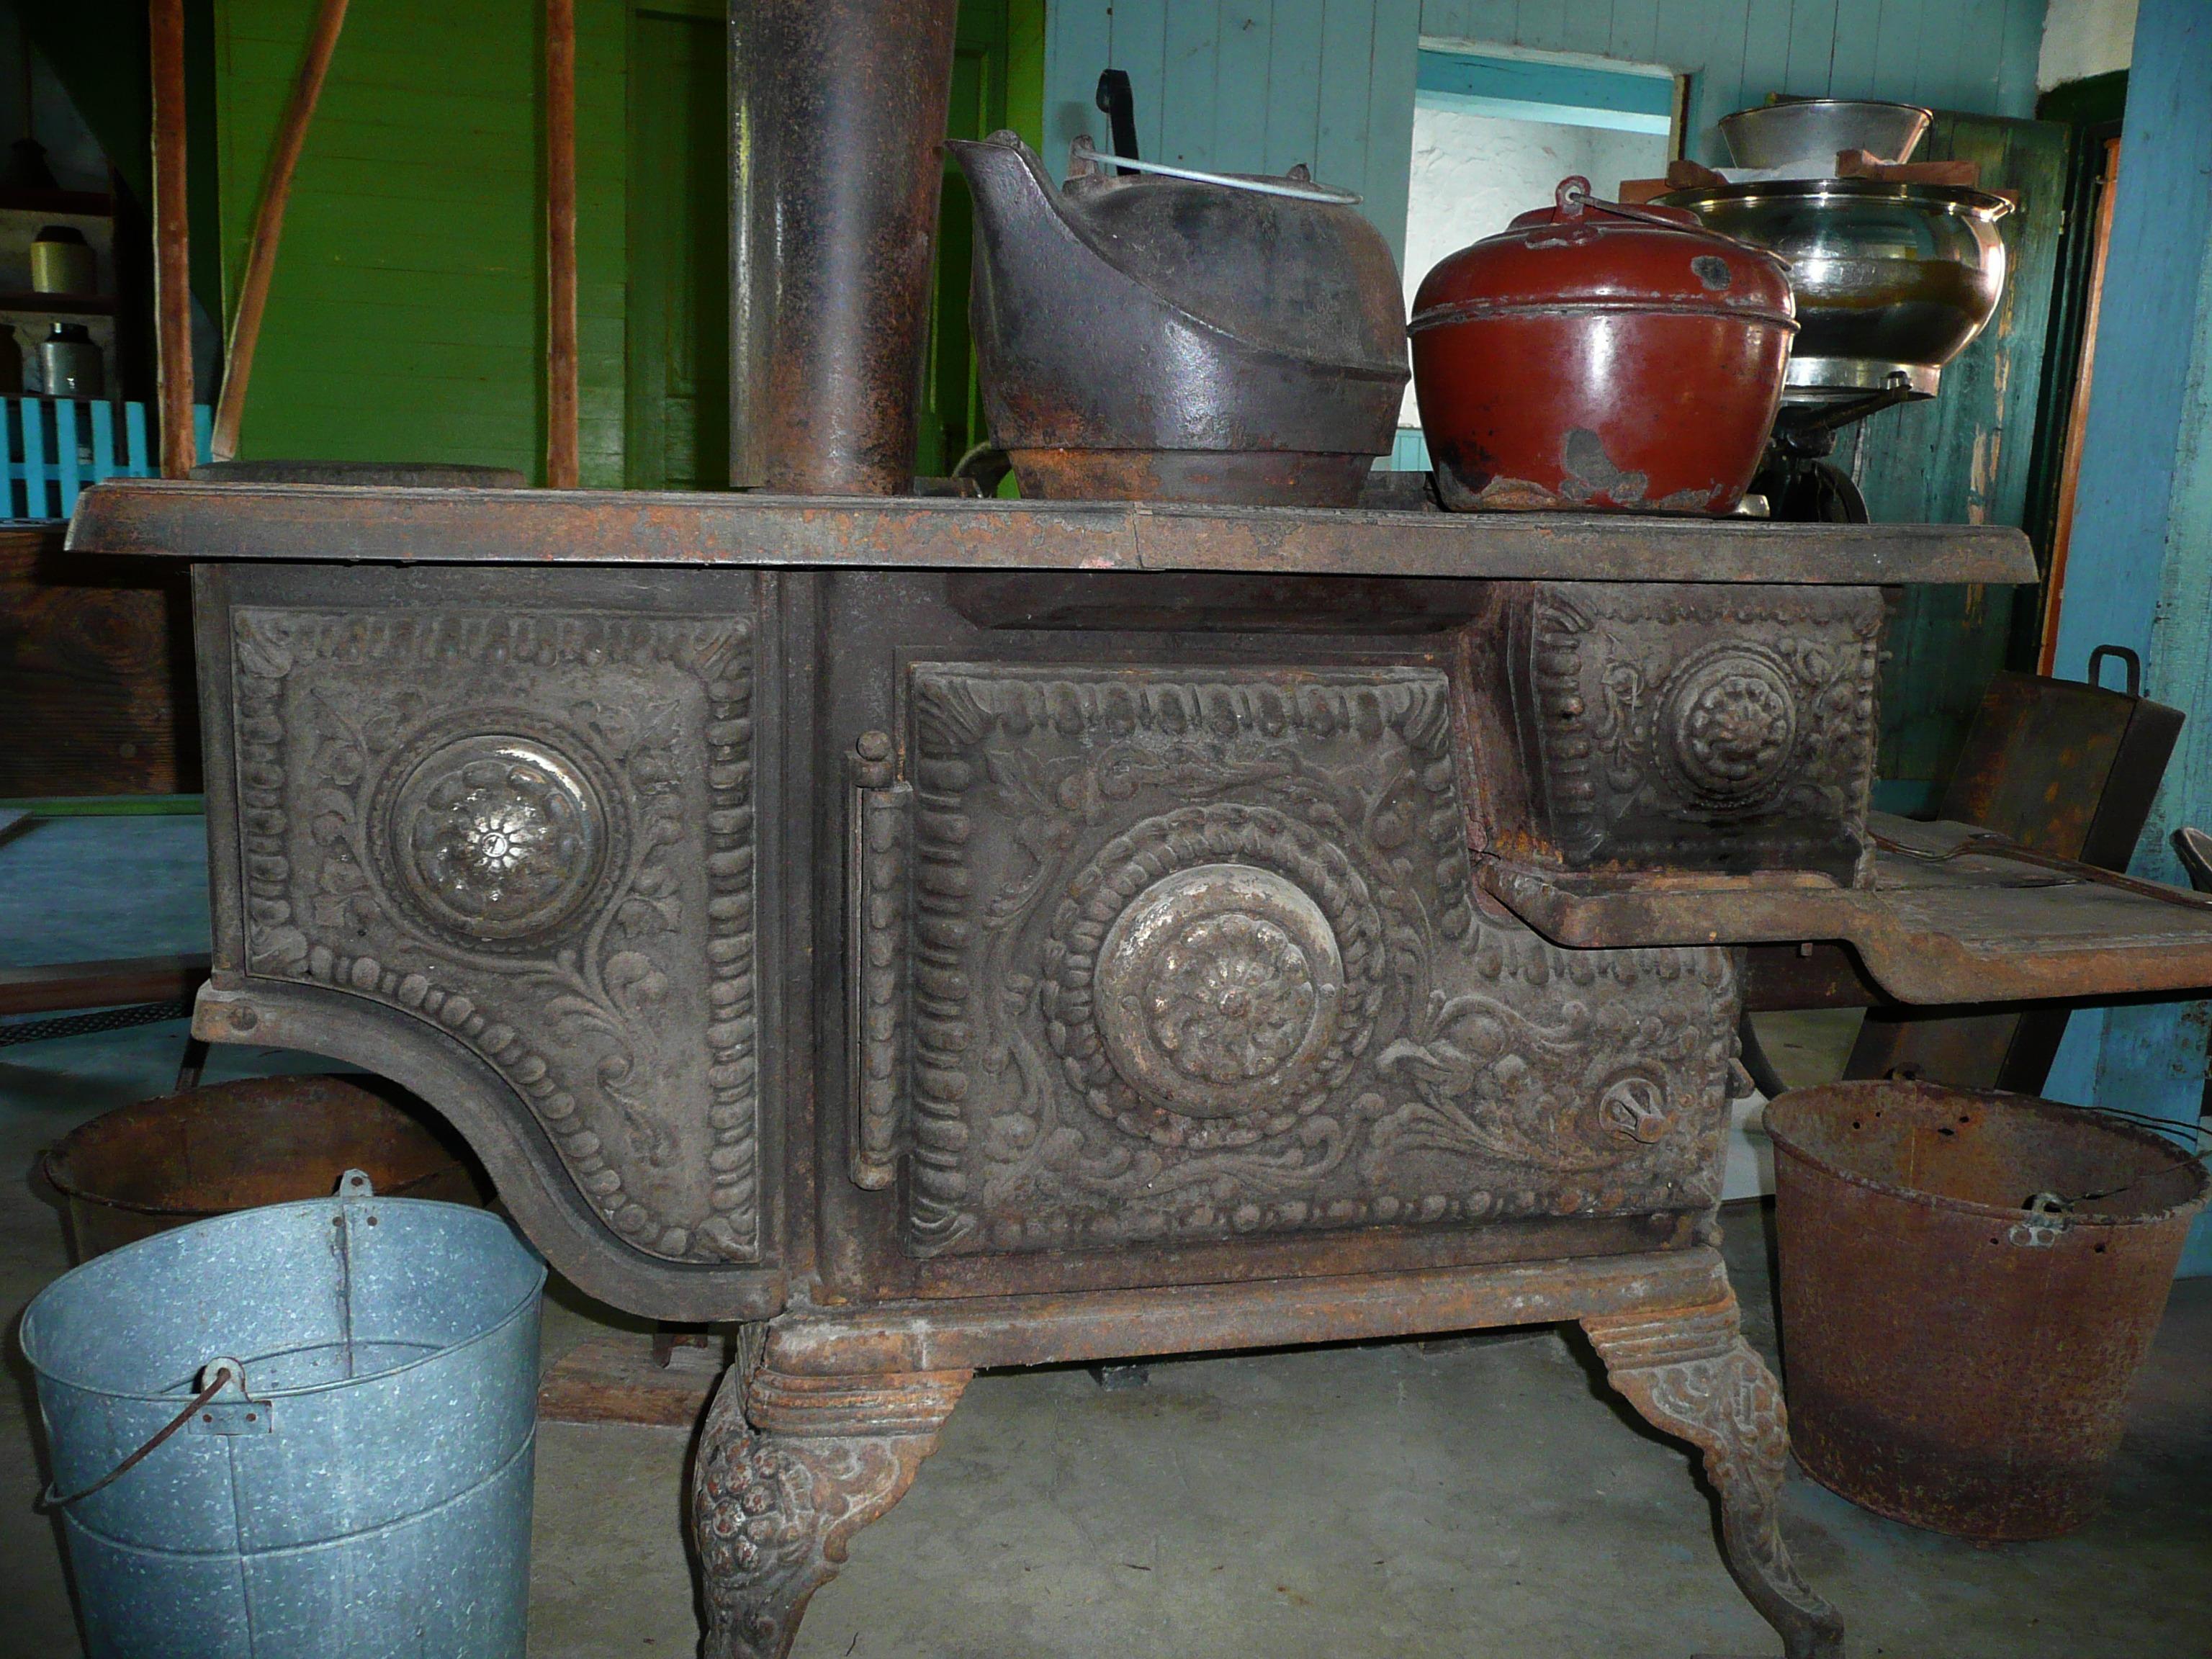 Fotos gratis : mesa, madera, antiguo, cocina, mueble, estufa, Canadá ...